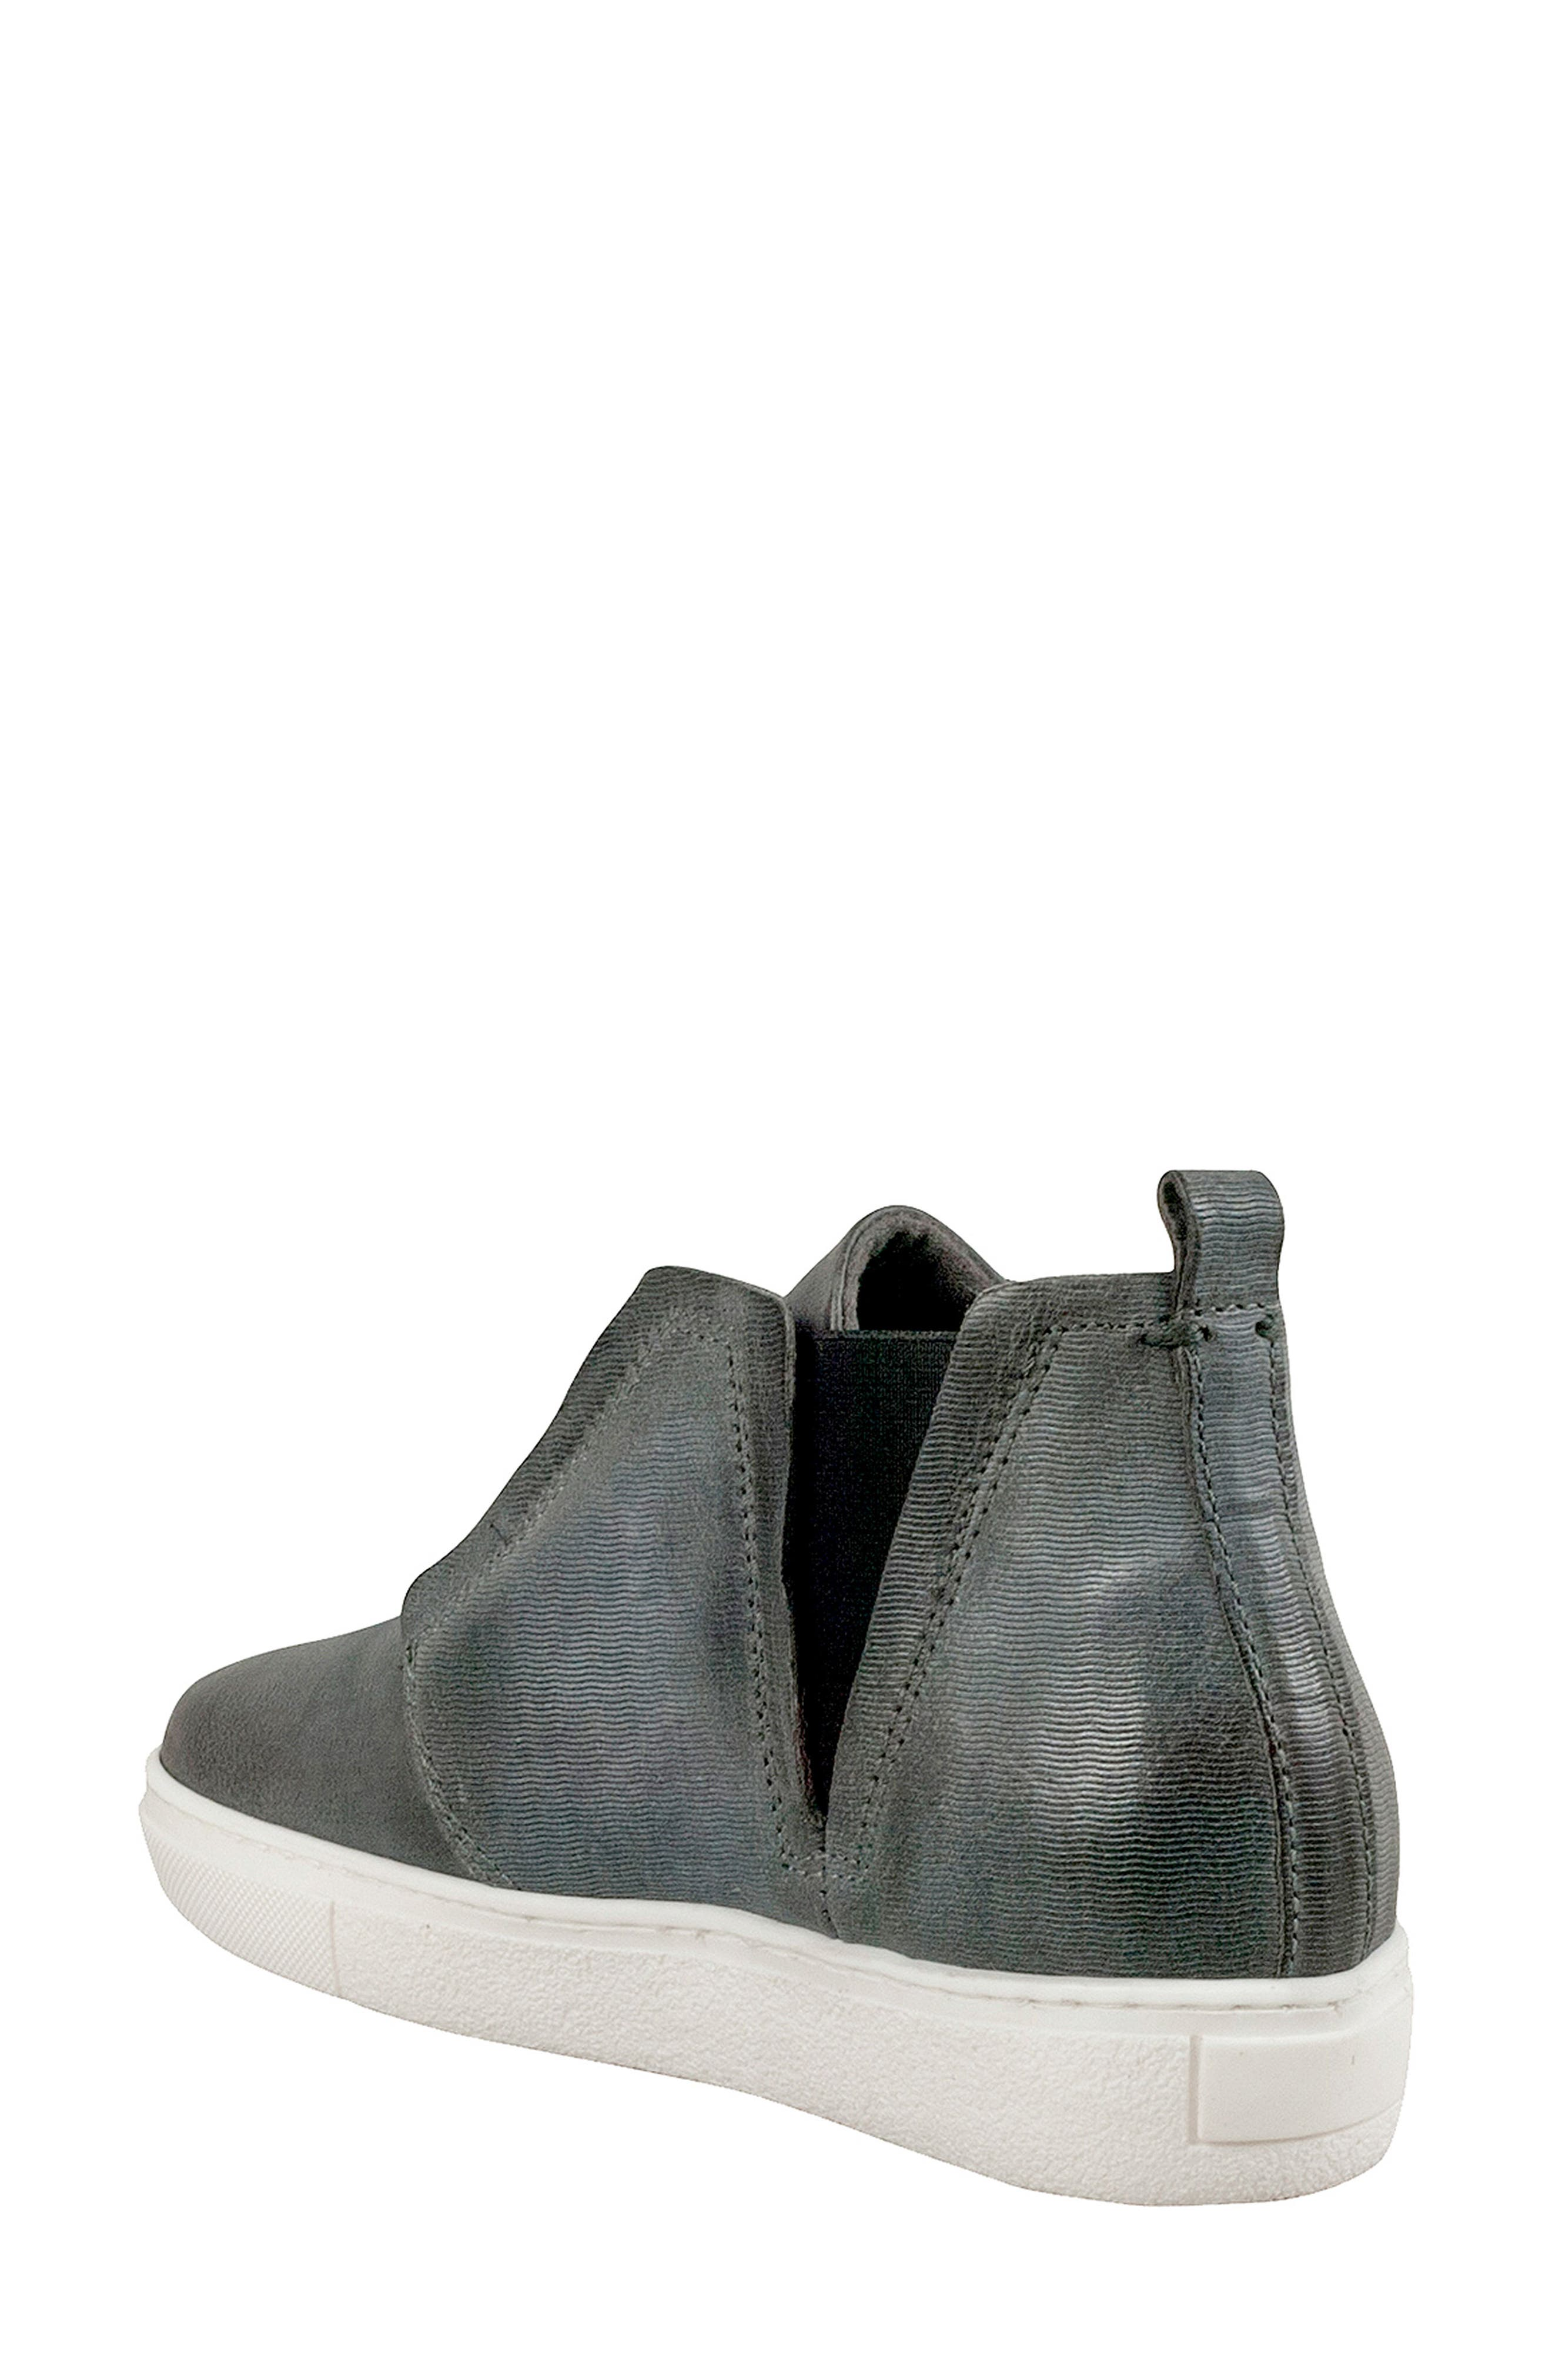 Laurent High Top Sneaker,                             Alternate thumbnail 2, color,                             GRANITE LEATHER